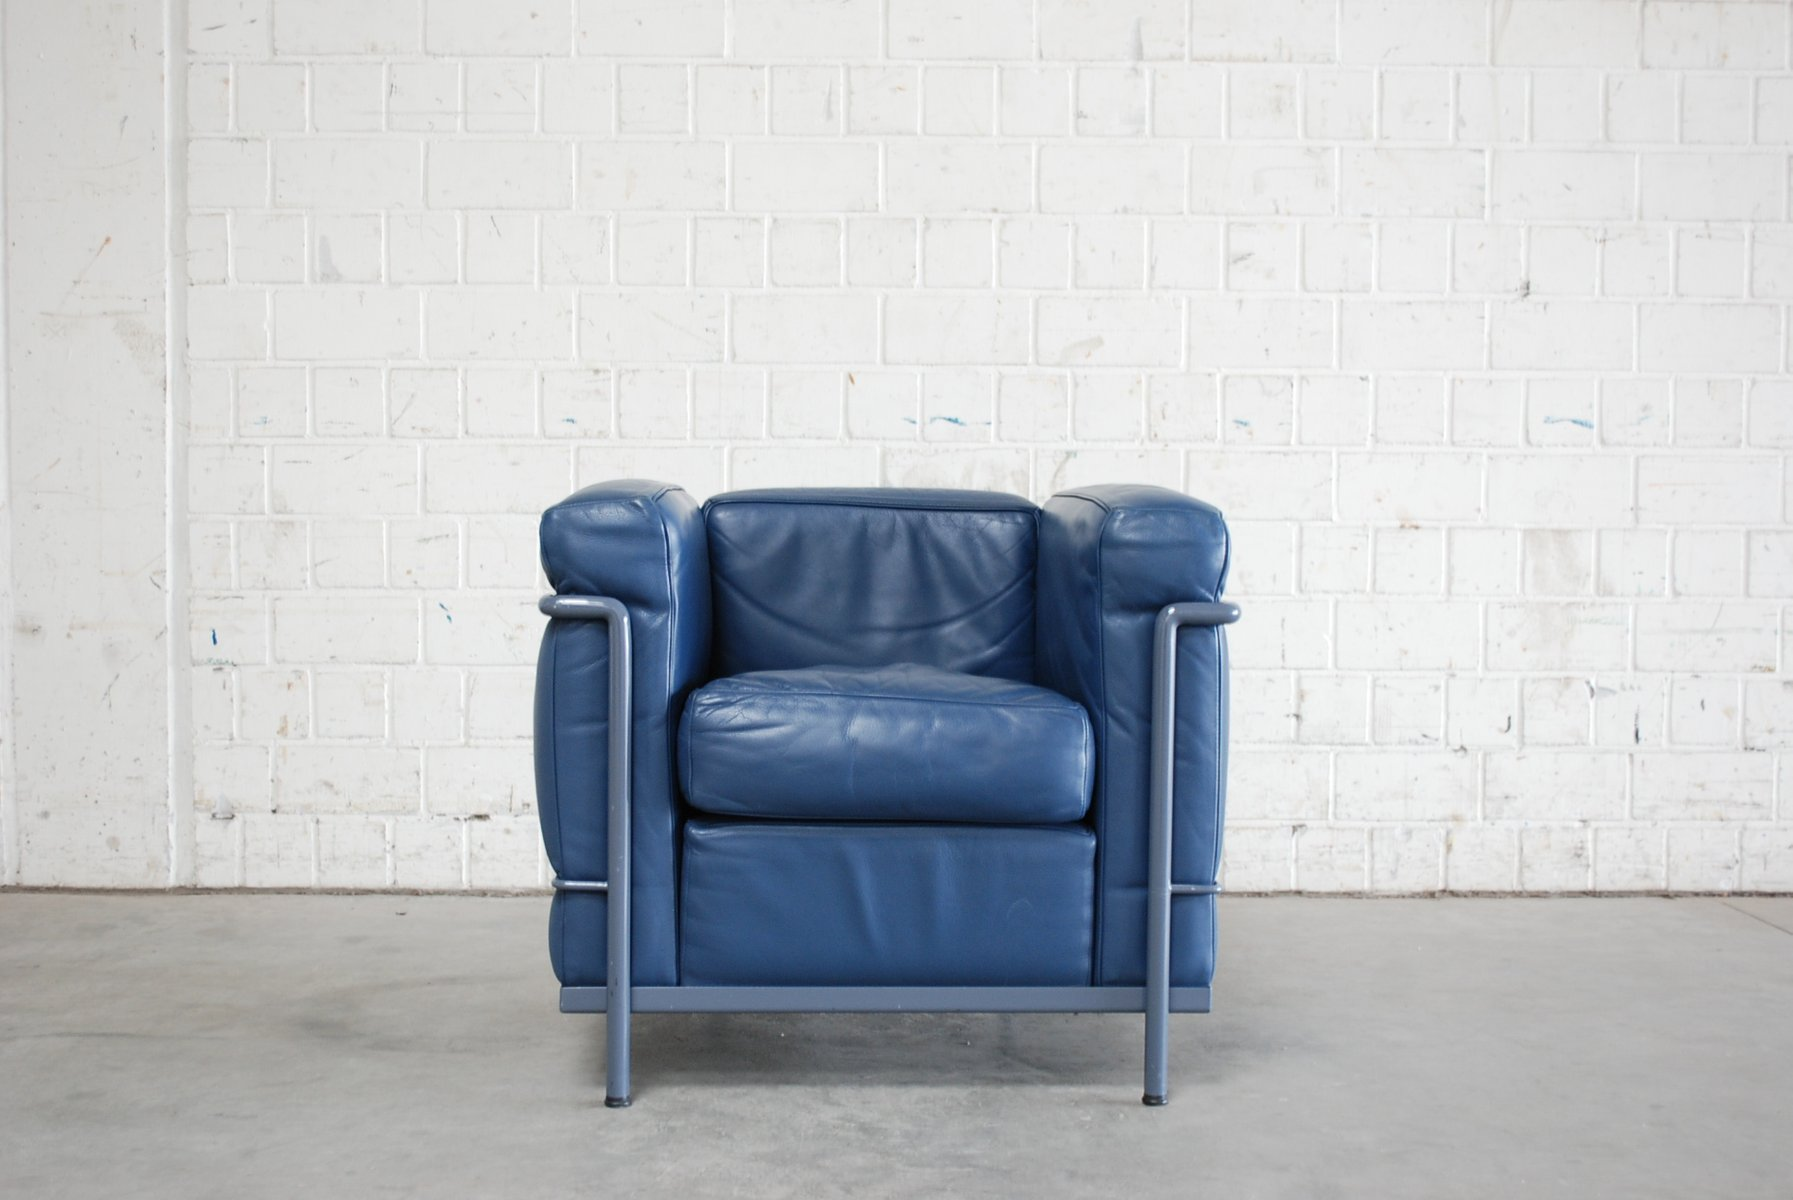 Vintage Blauer Modell LC2 Ledersessel von Le Corbusier für Cassina